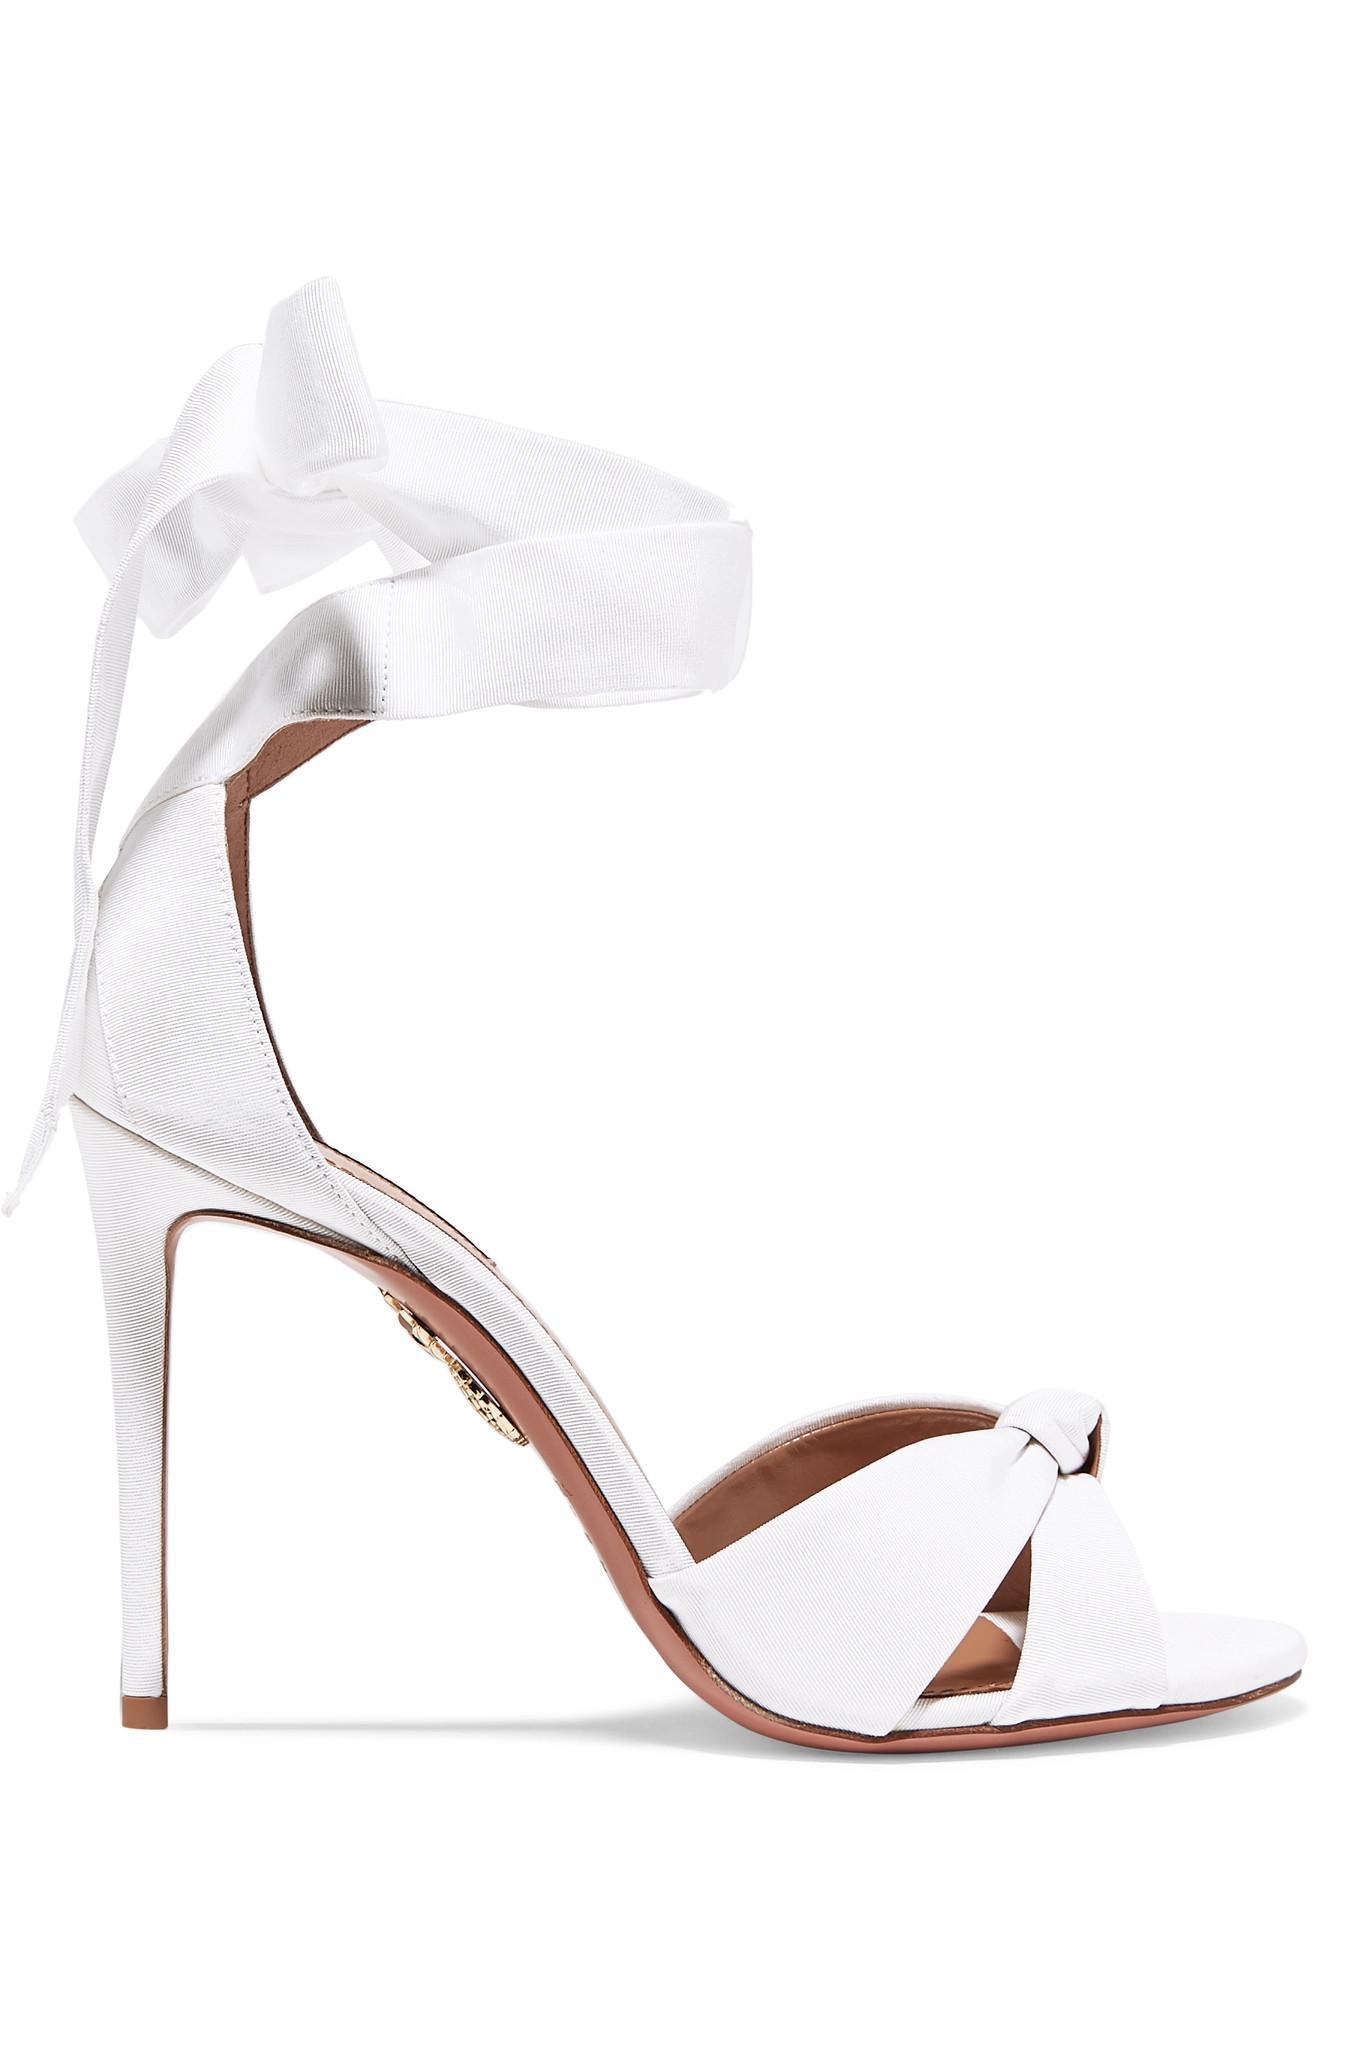 3575f36783c7 Aquazzura All Tied Up Grosgrain Sandals in White - Lyst